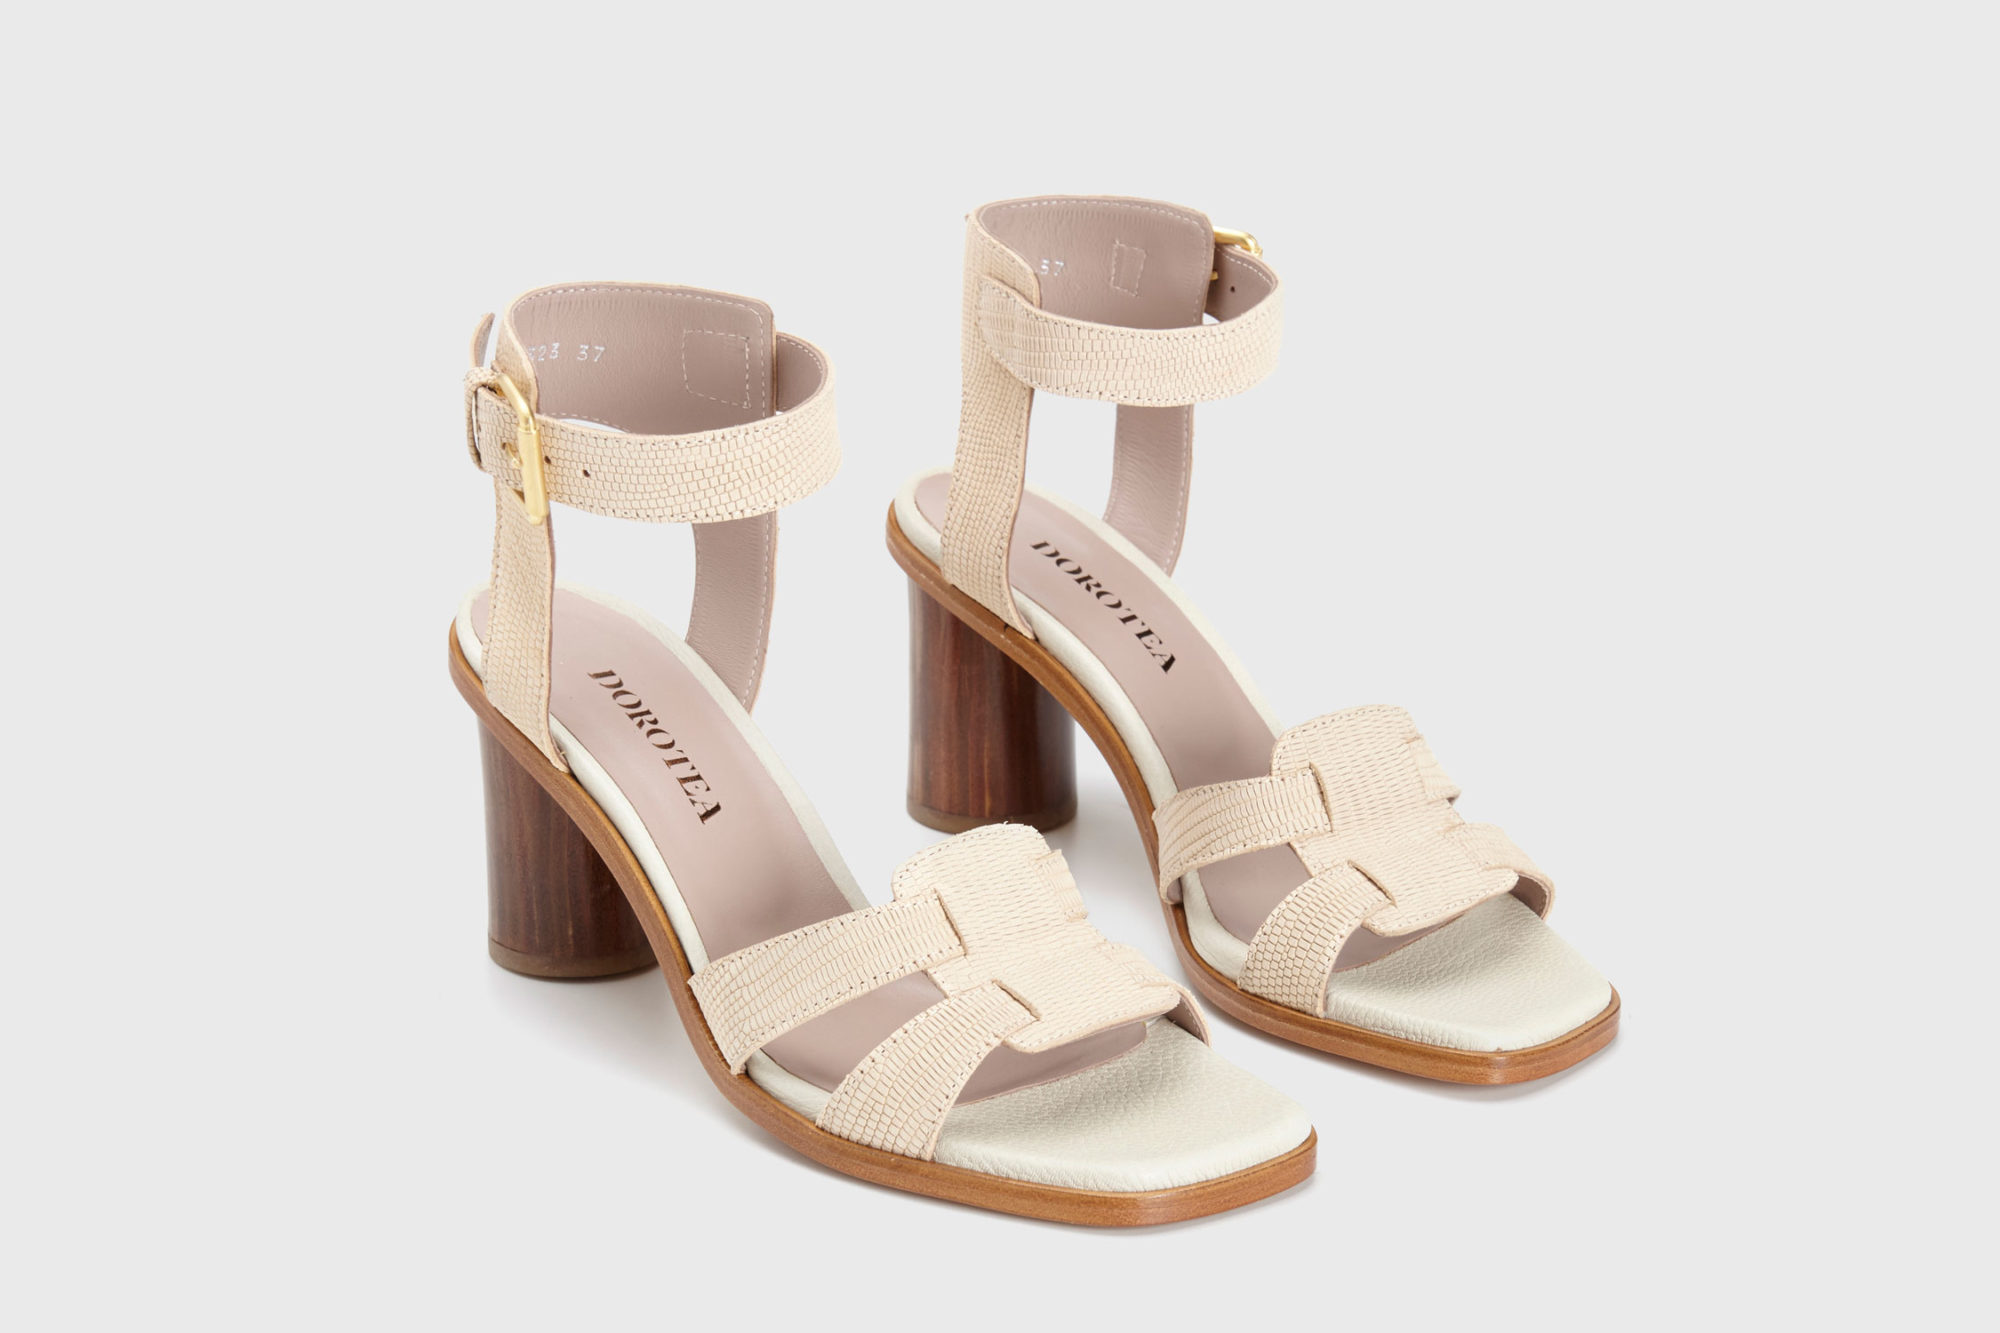 Dorotea sandalia de tacón alto Lianne nude ss17 par